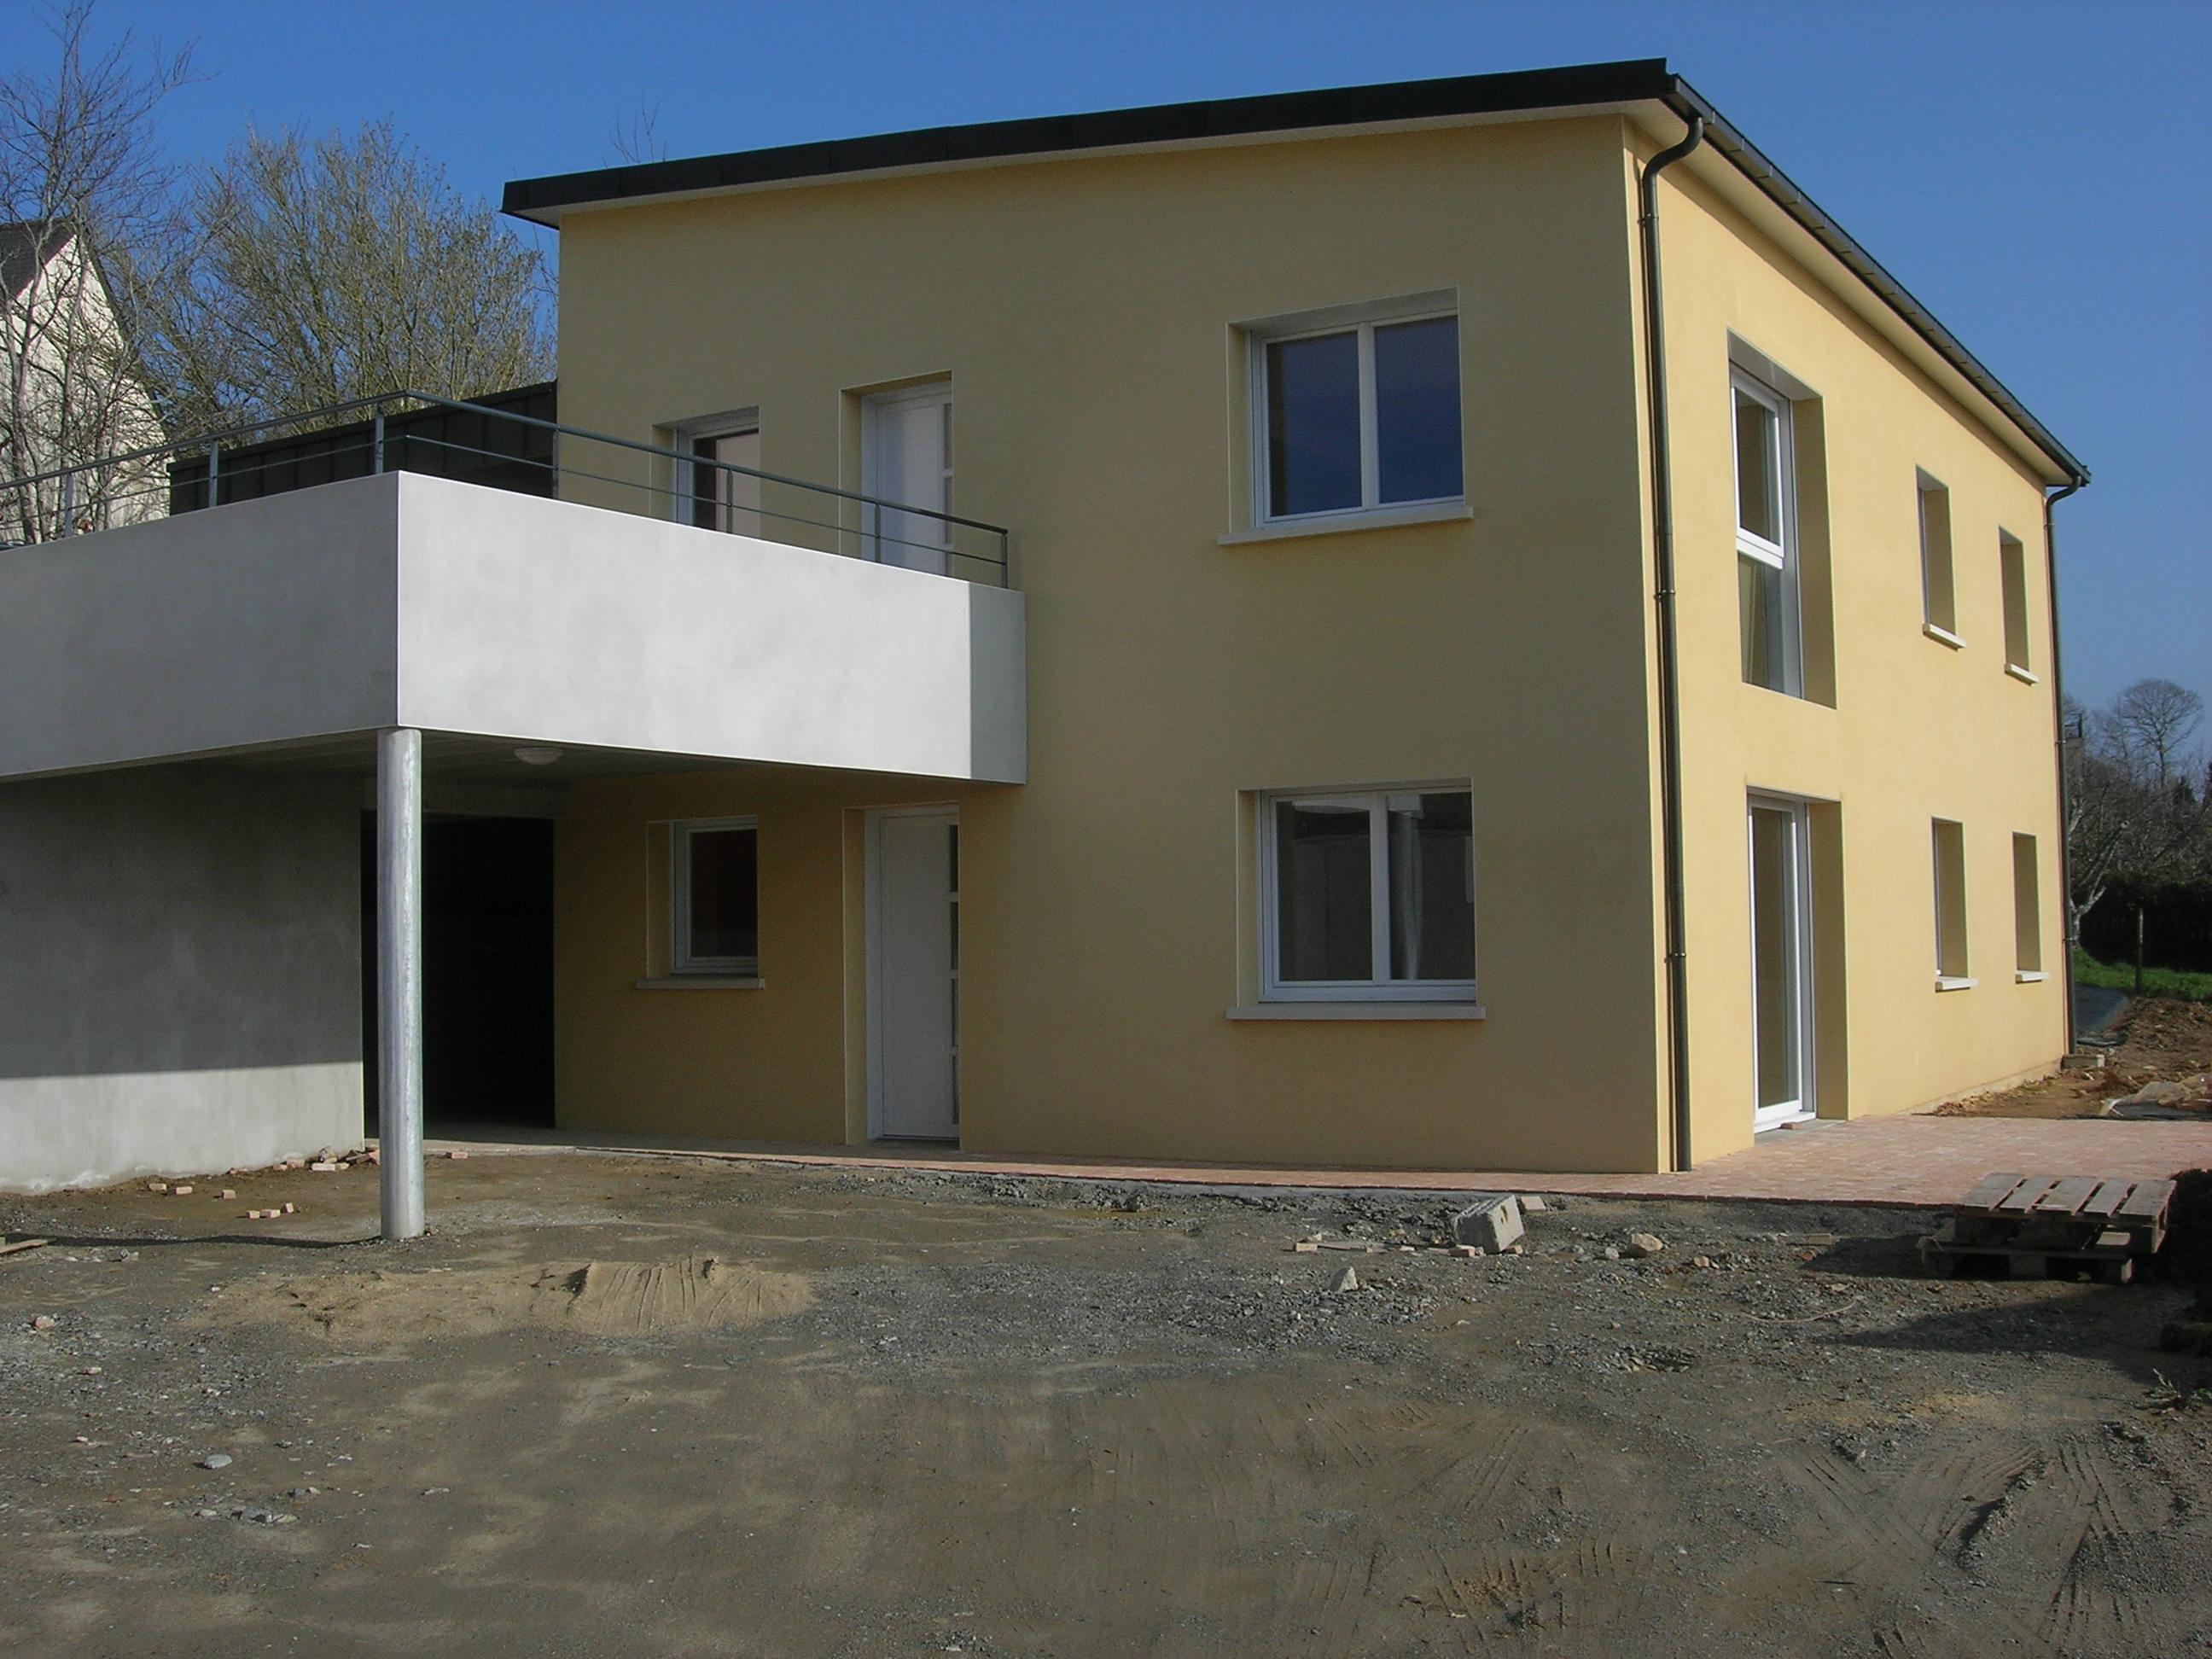 constructeur maison brest environ ventana blog. Black Bedroom Furniture Sets. Home Design Ideas